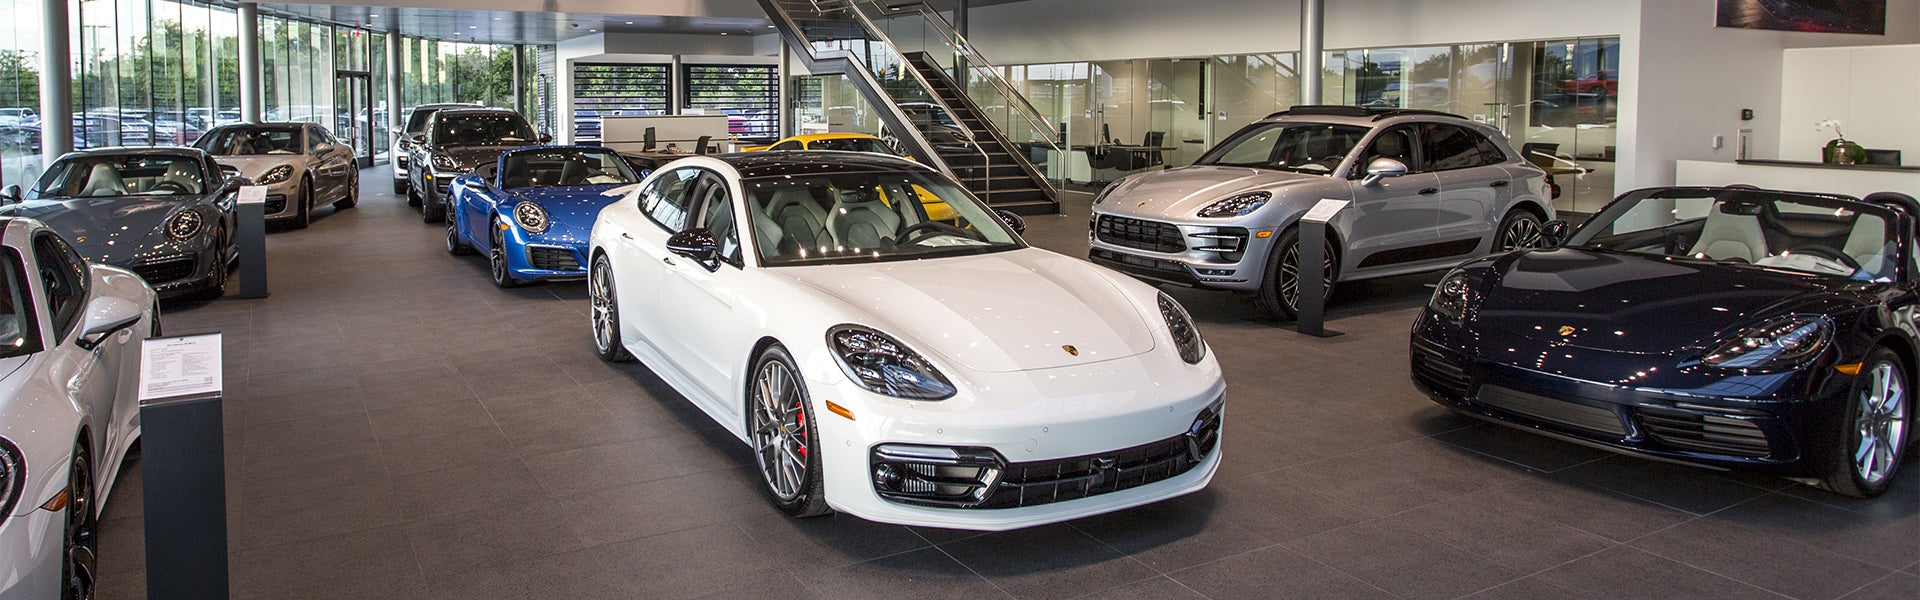 Porsche North Houston Interior Showroom Panamera Turbo